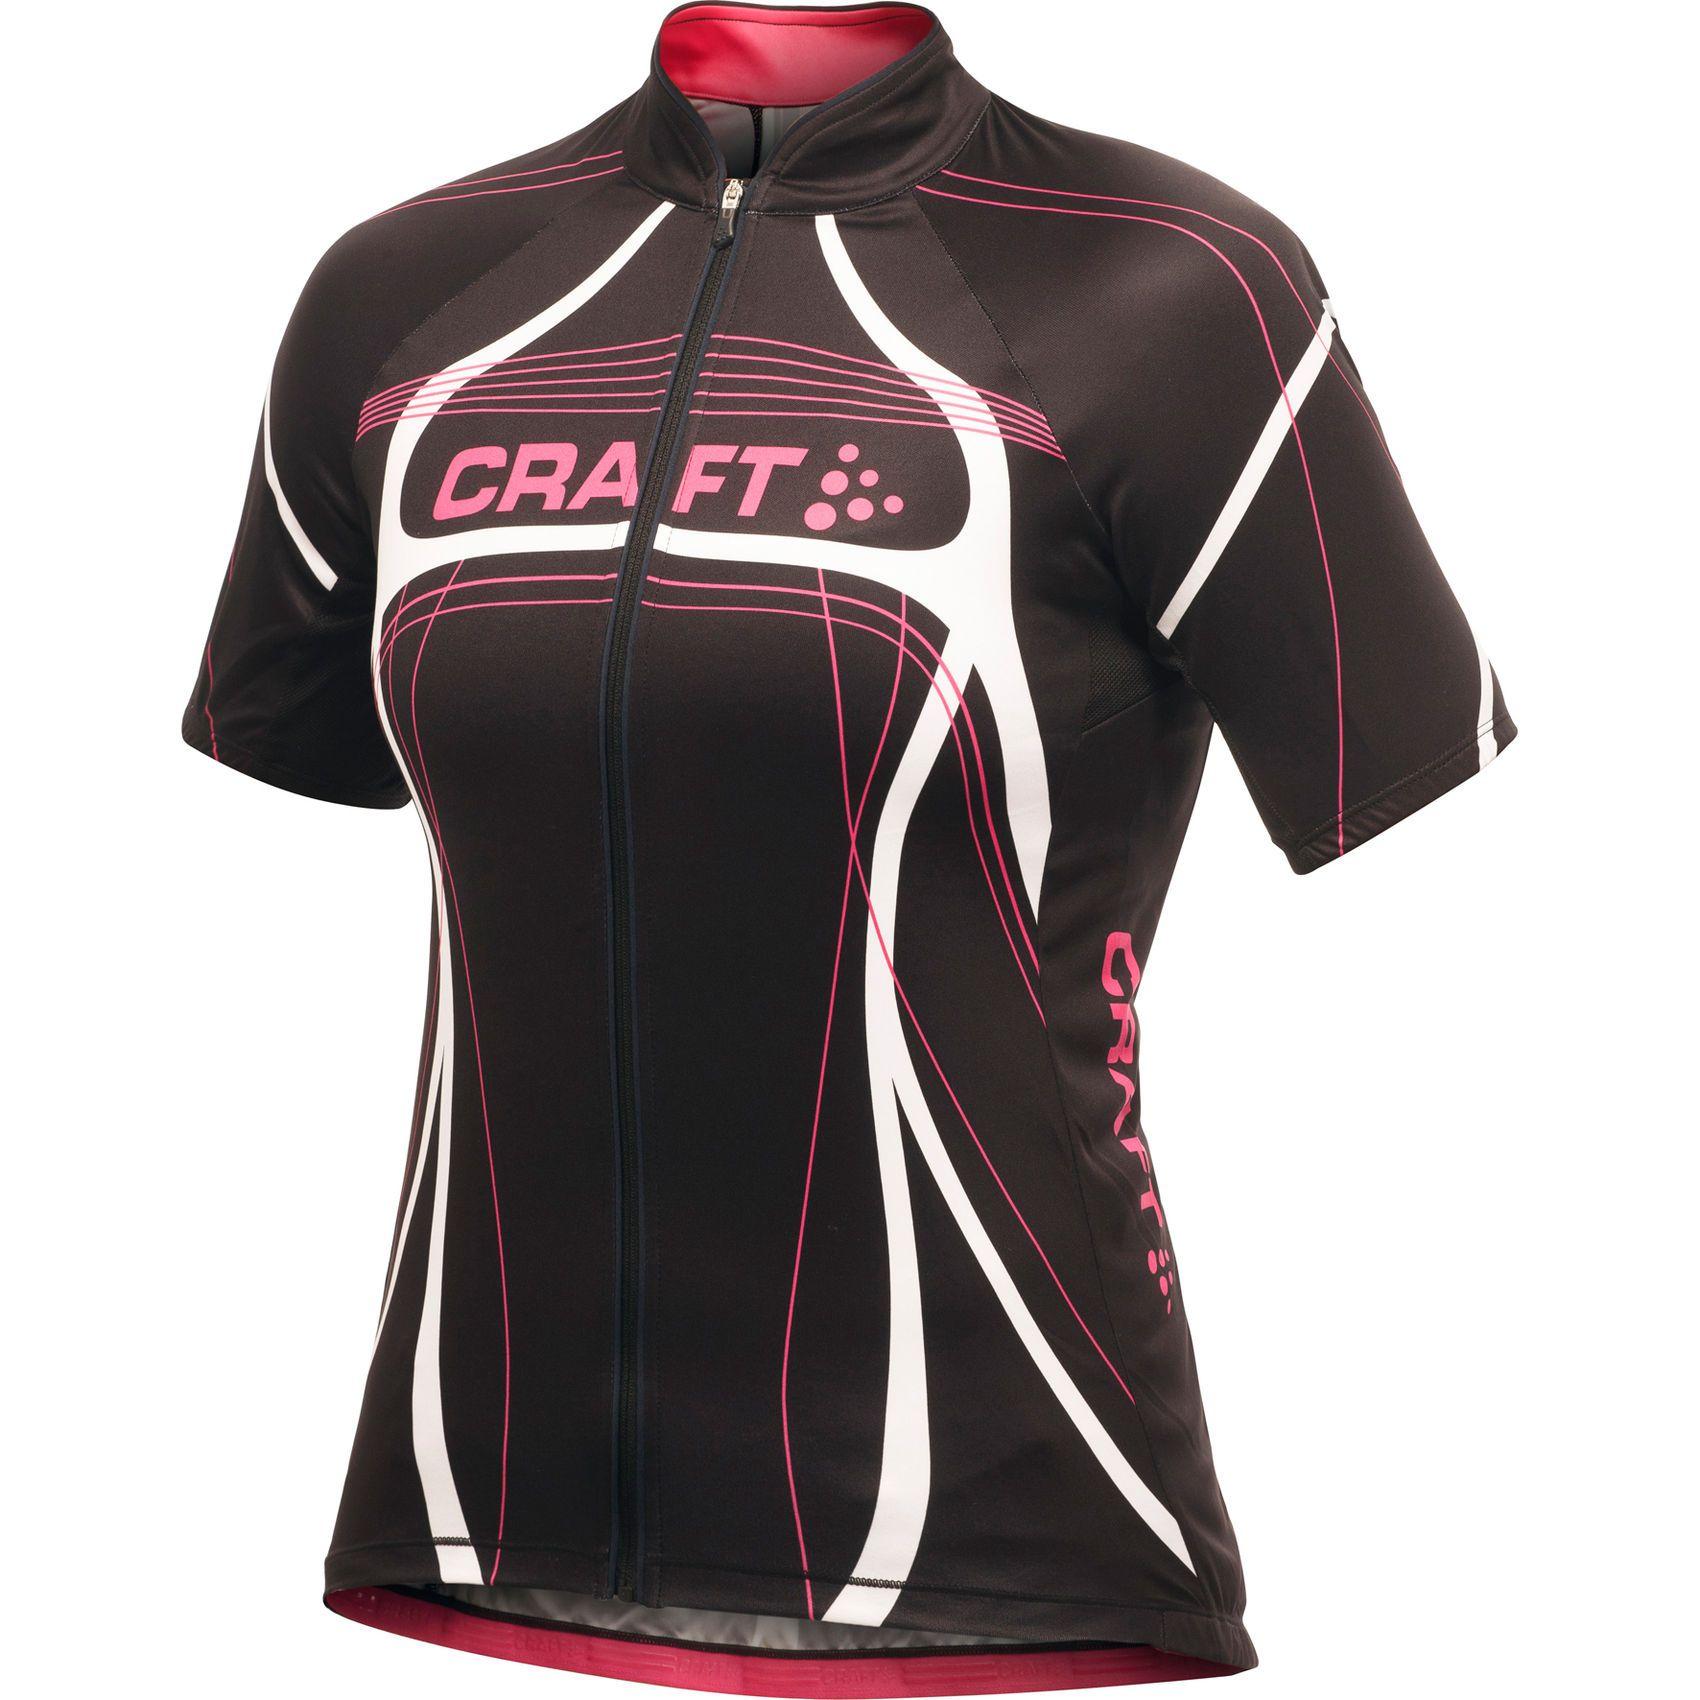 Wiggle | Craft Ladies Performance Bike Tour Jersey - AW12 Short Sleeve Cycling Jerseys